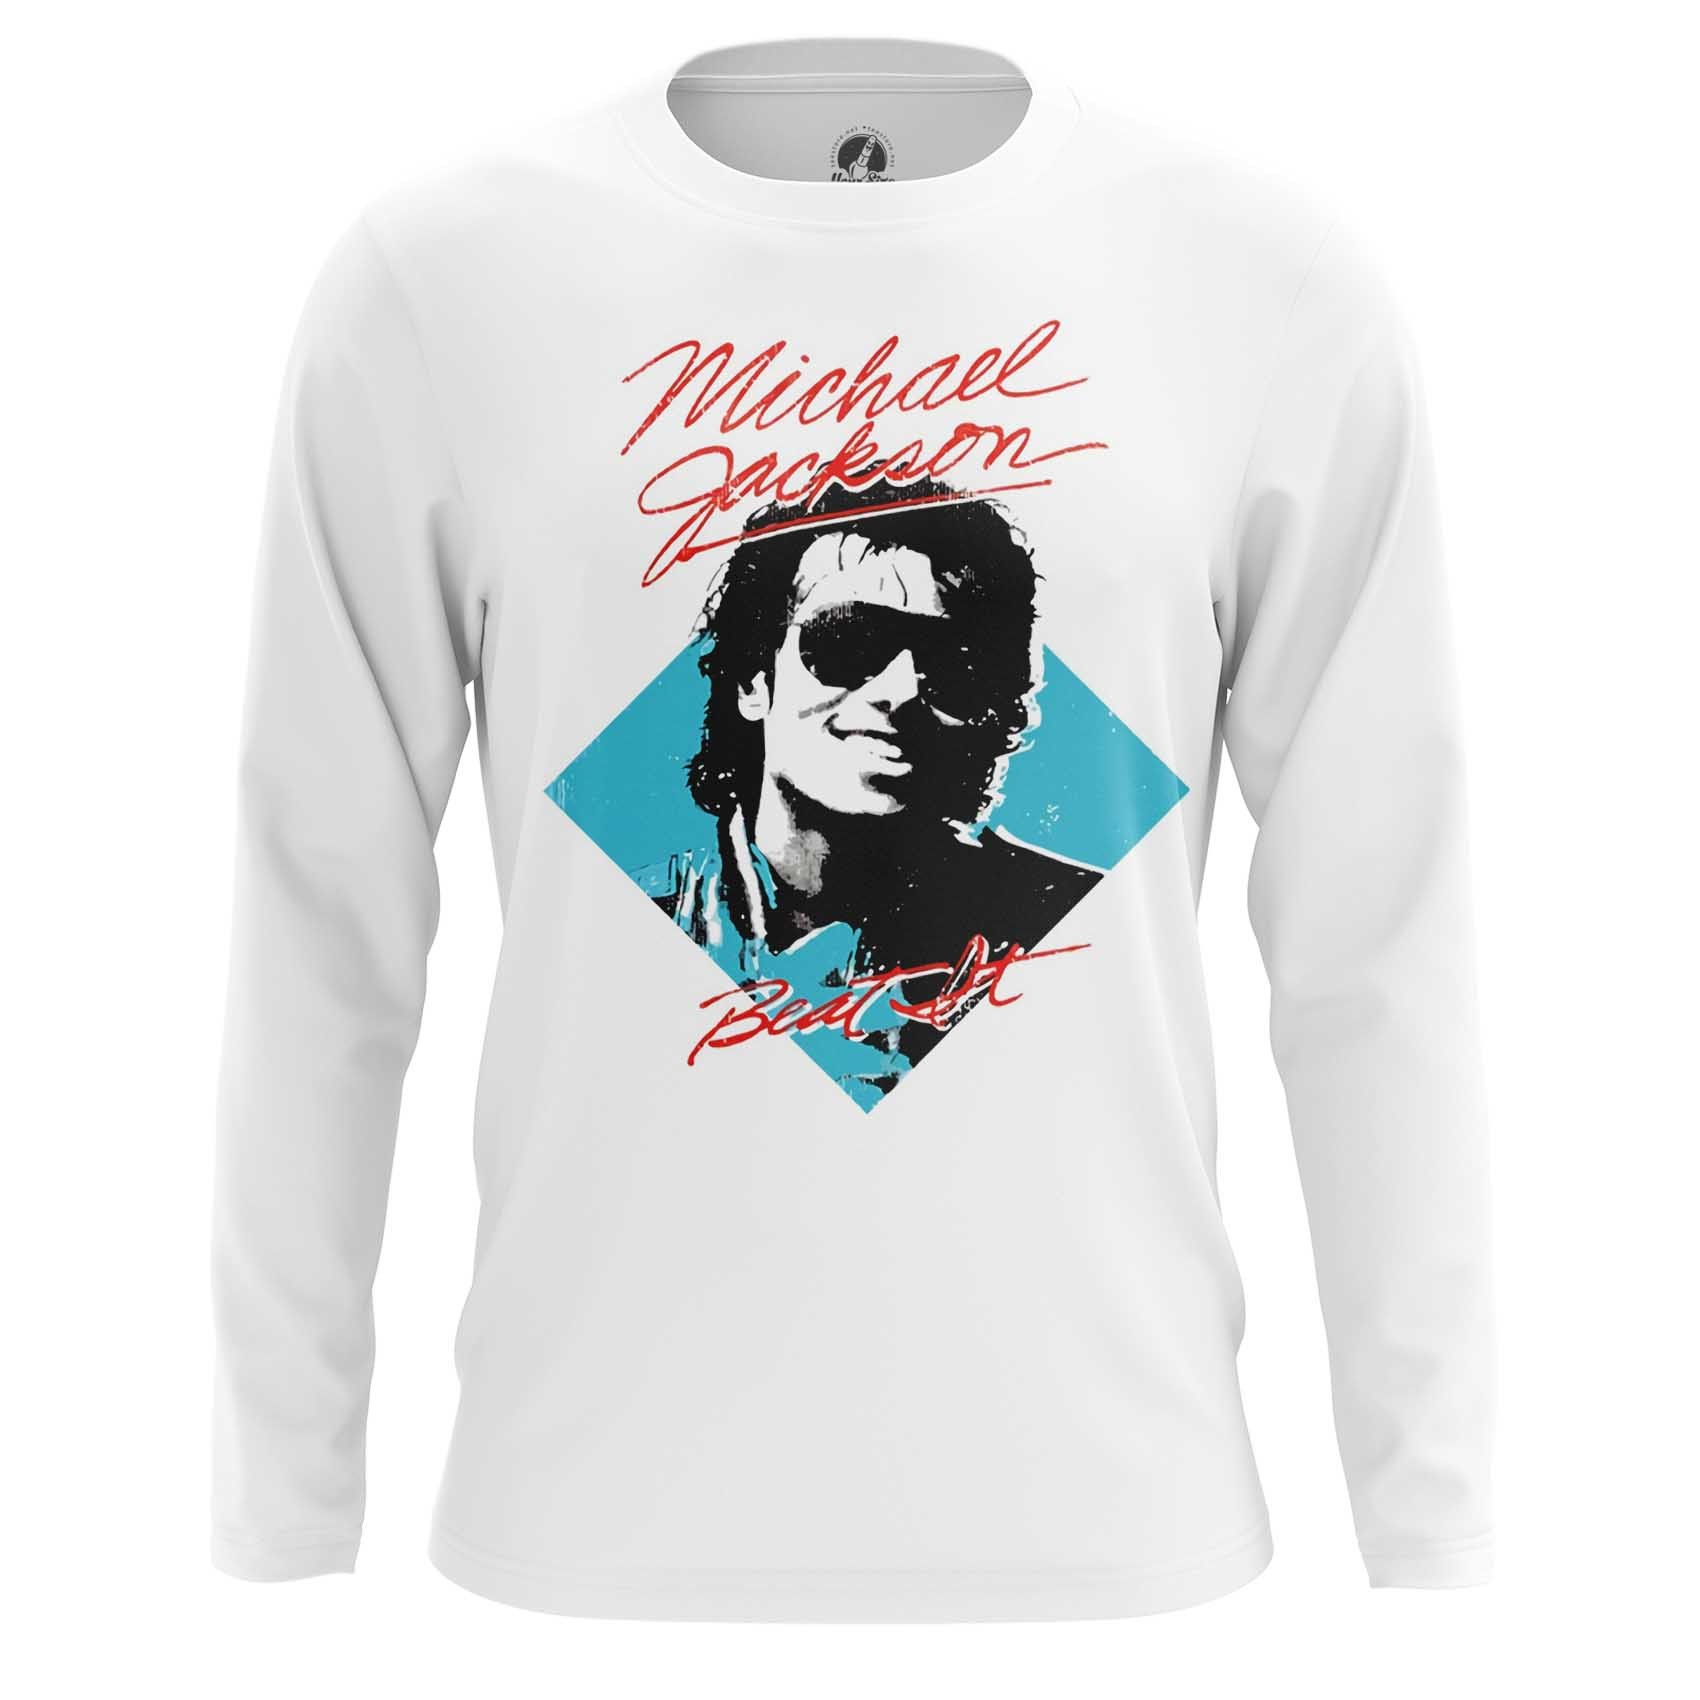 Merchandise Men'S T-Shirt Beat It Michael Jackson Merch Top